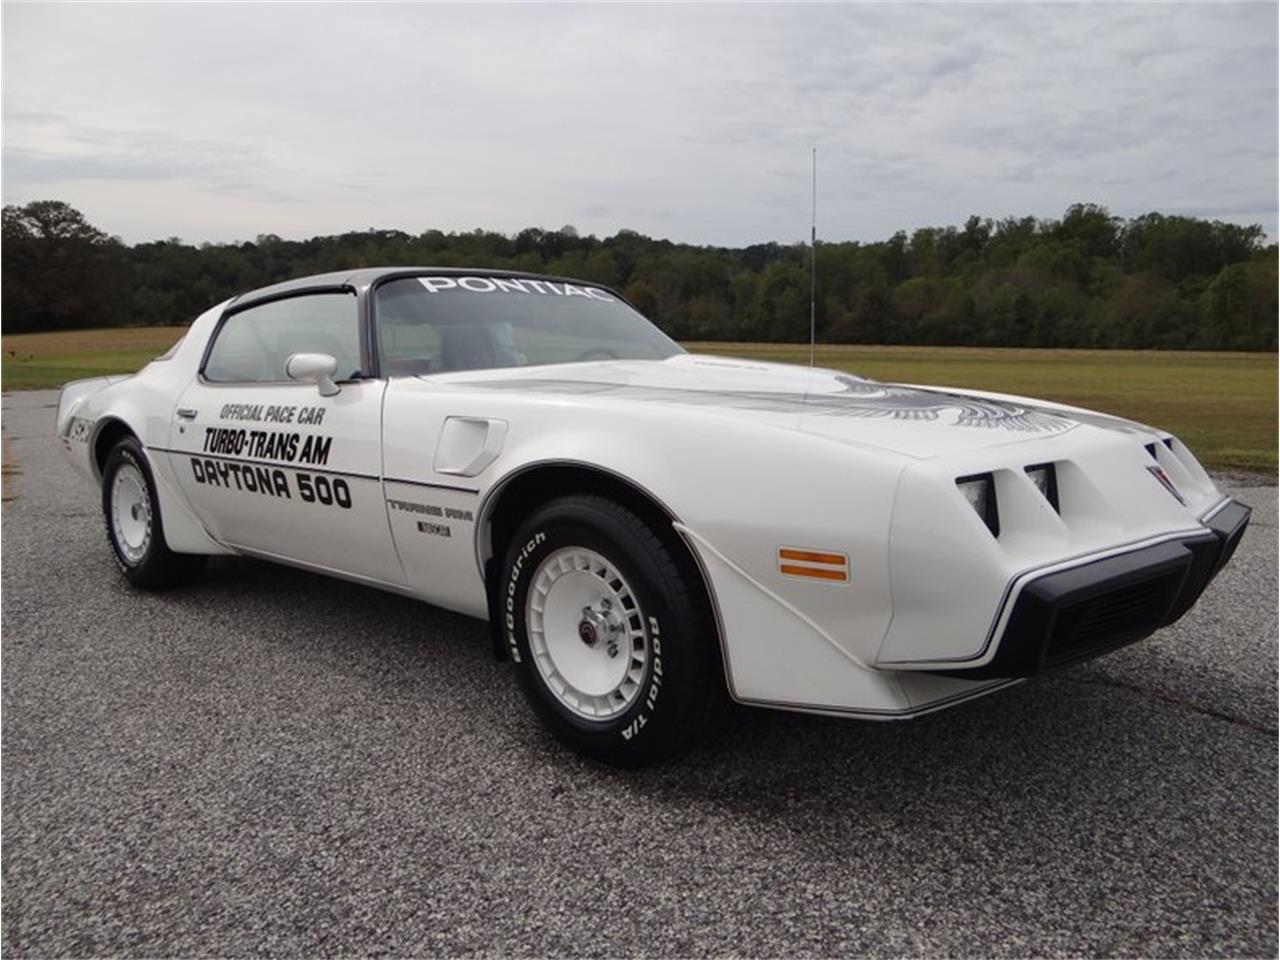 1981 Pontiac Firebird Trans Am (CC-1273085) for sale in Greensboro, North Carolina